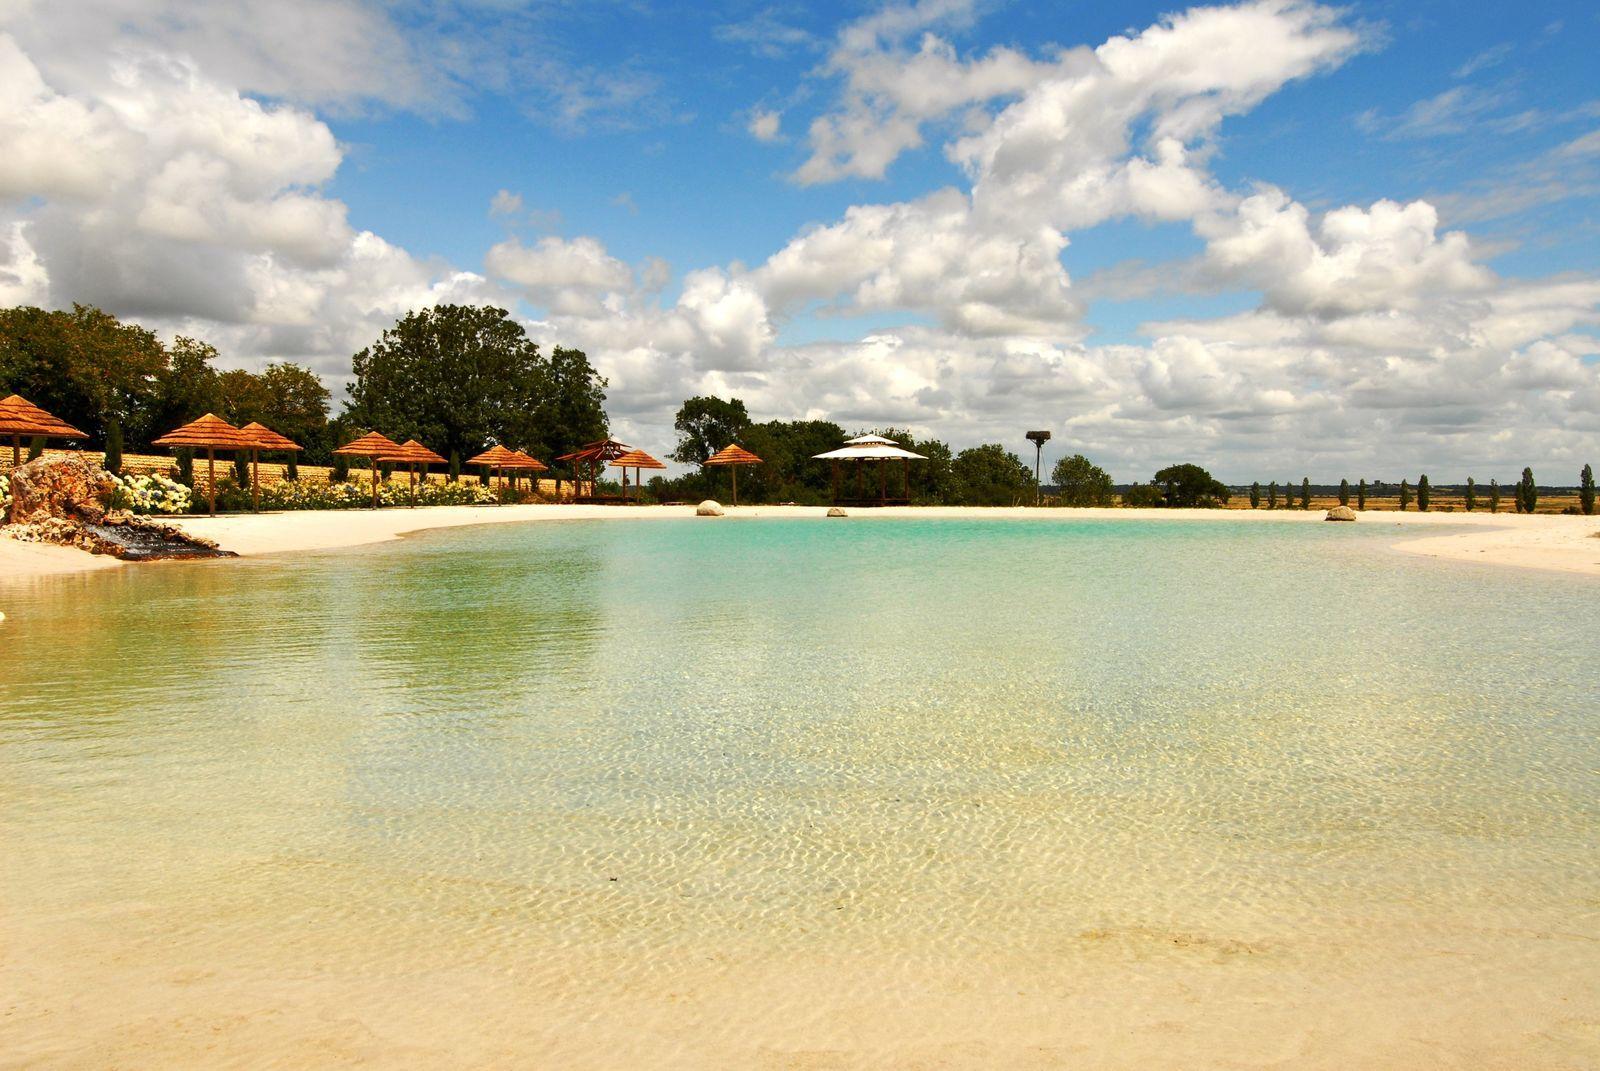 Domaine les Marées - 7. l'Iris des Marais luxe vakantievilla met zwembad in Frankrijk